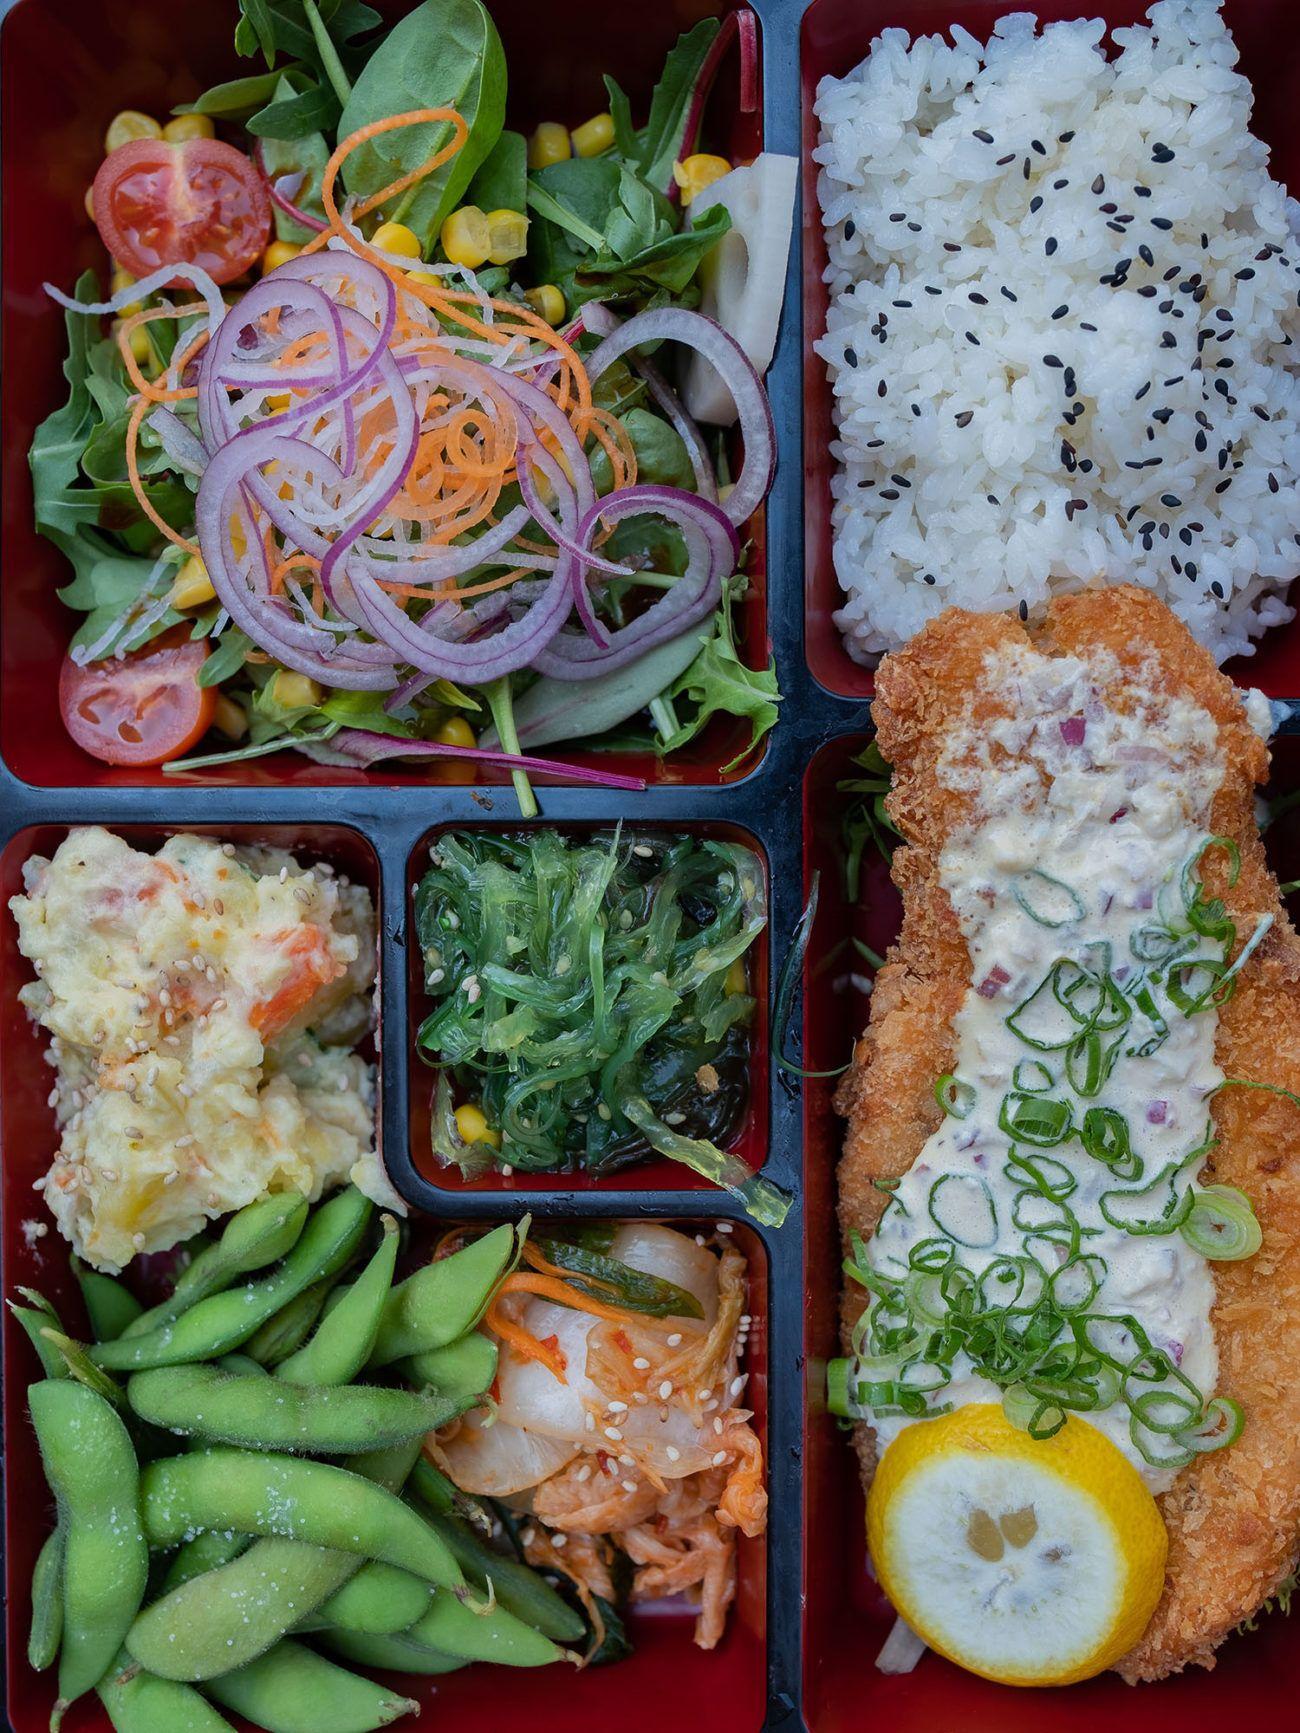 Foodblog About Fuel, Restaurant CHOTTO Berlin, Bento Box, Lachs